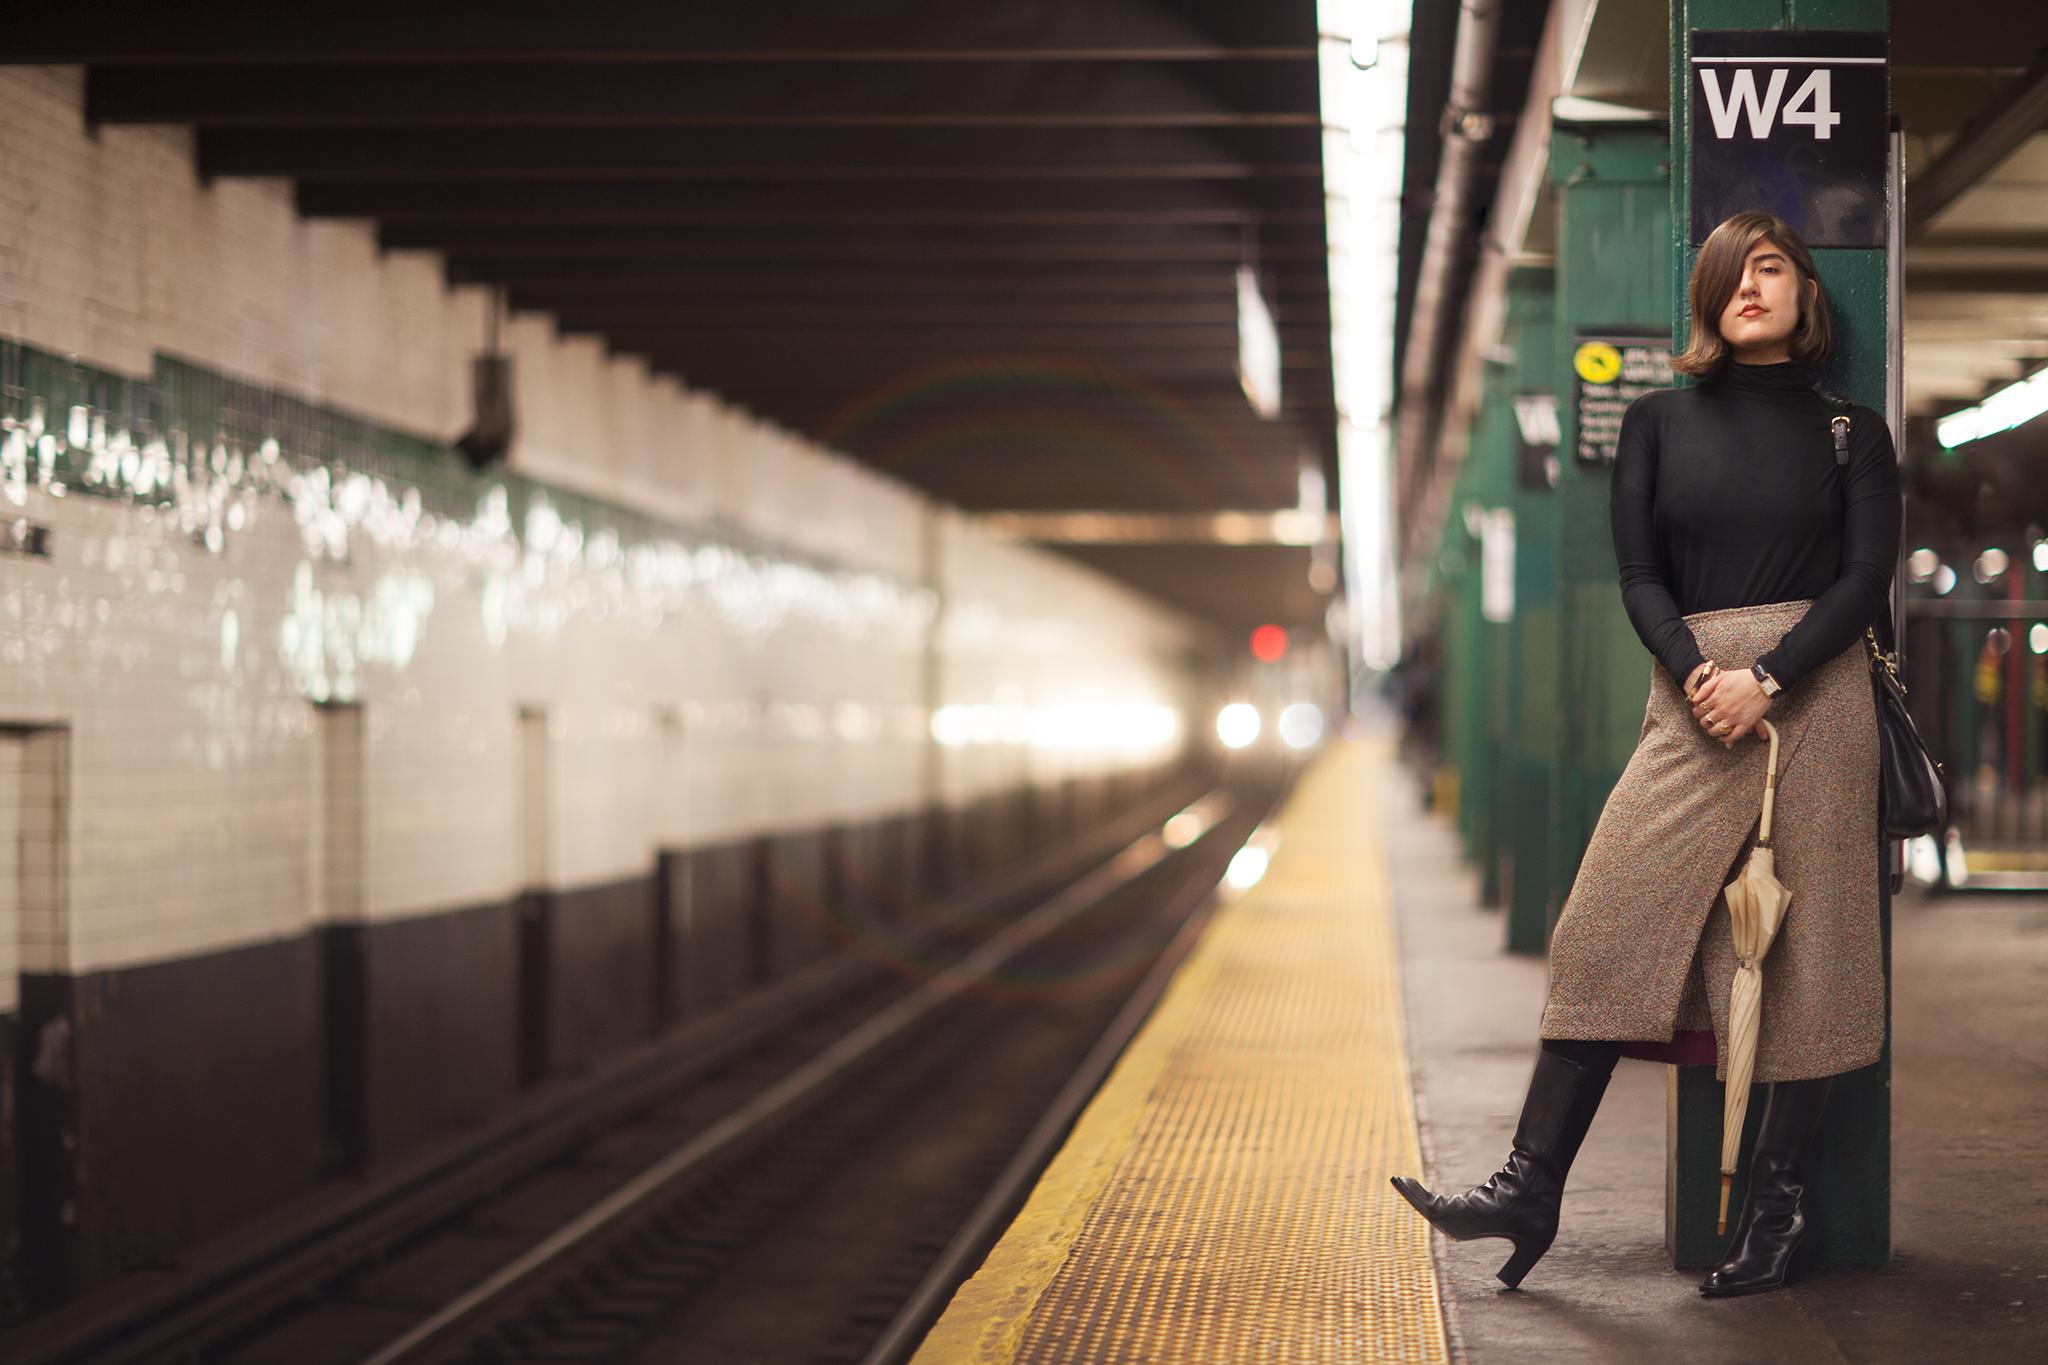 QFB-NYC-Subway440lr.jpg